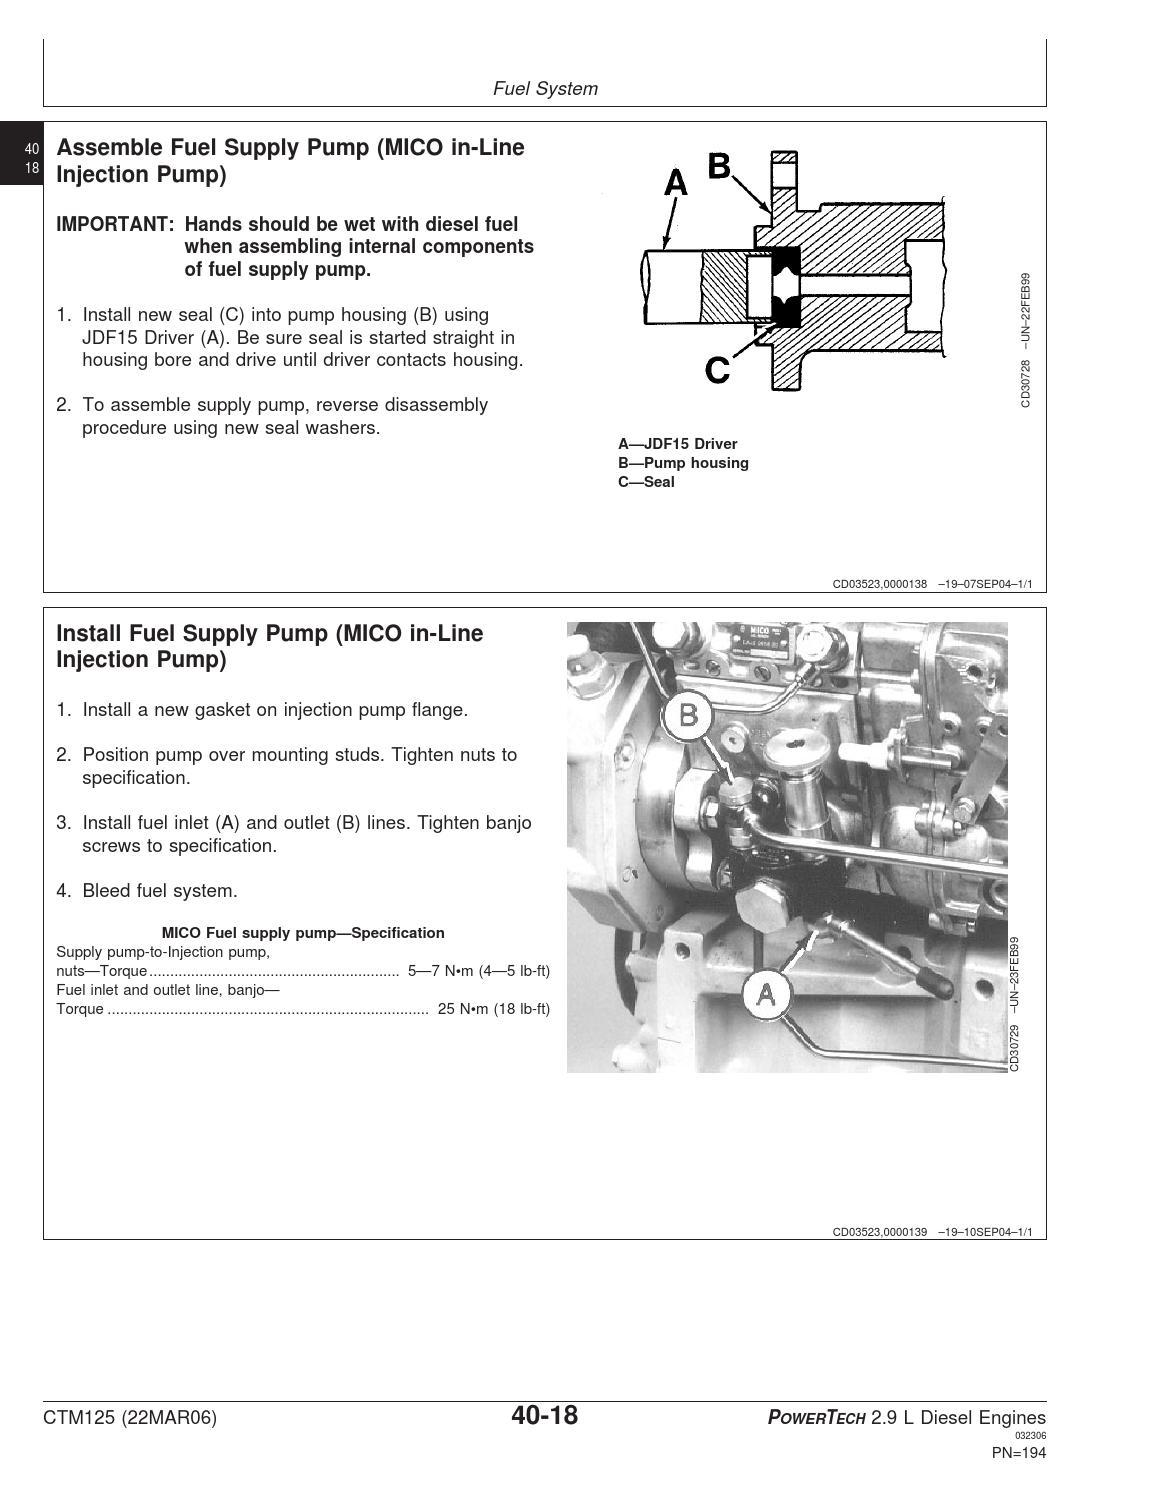 JOHN DEERE WORKSHOP MANUAL FOR ENGINE 3029 by Power